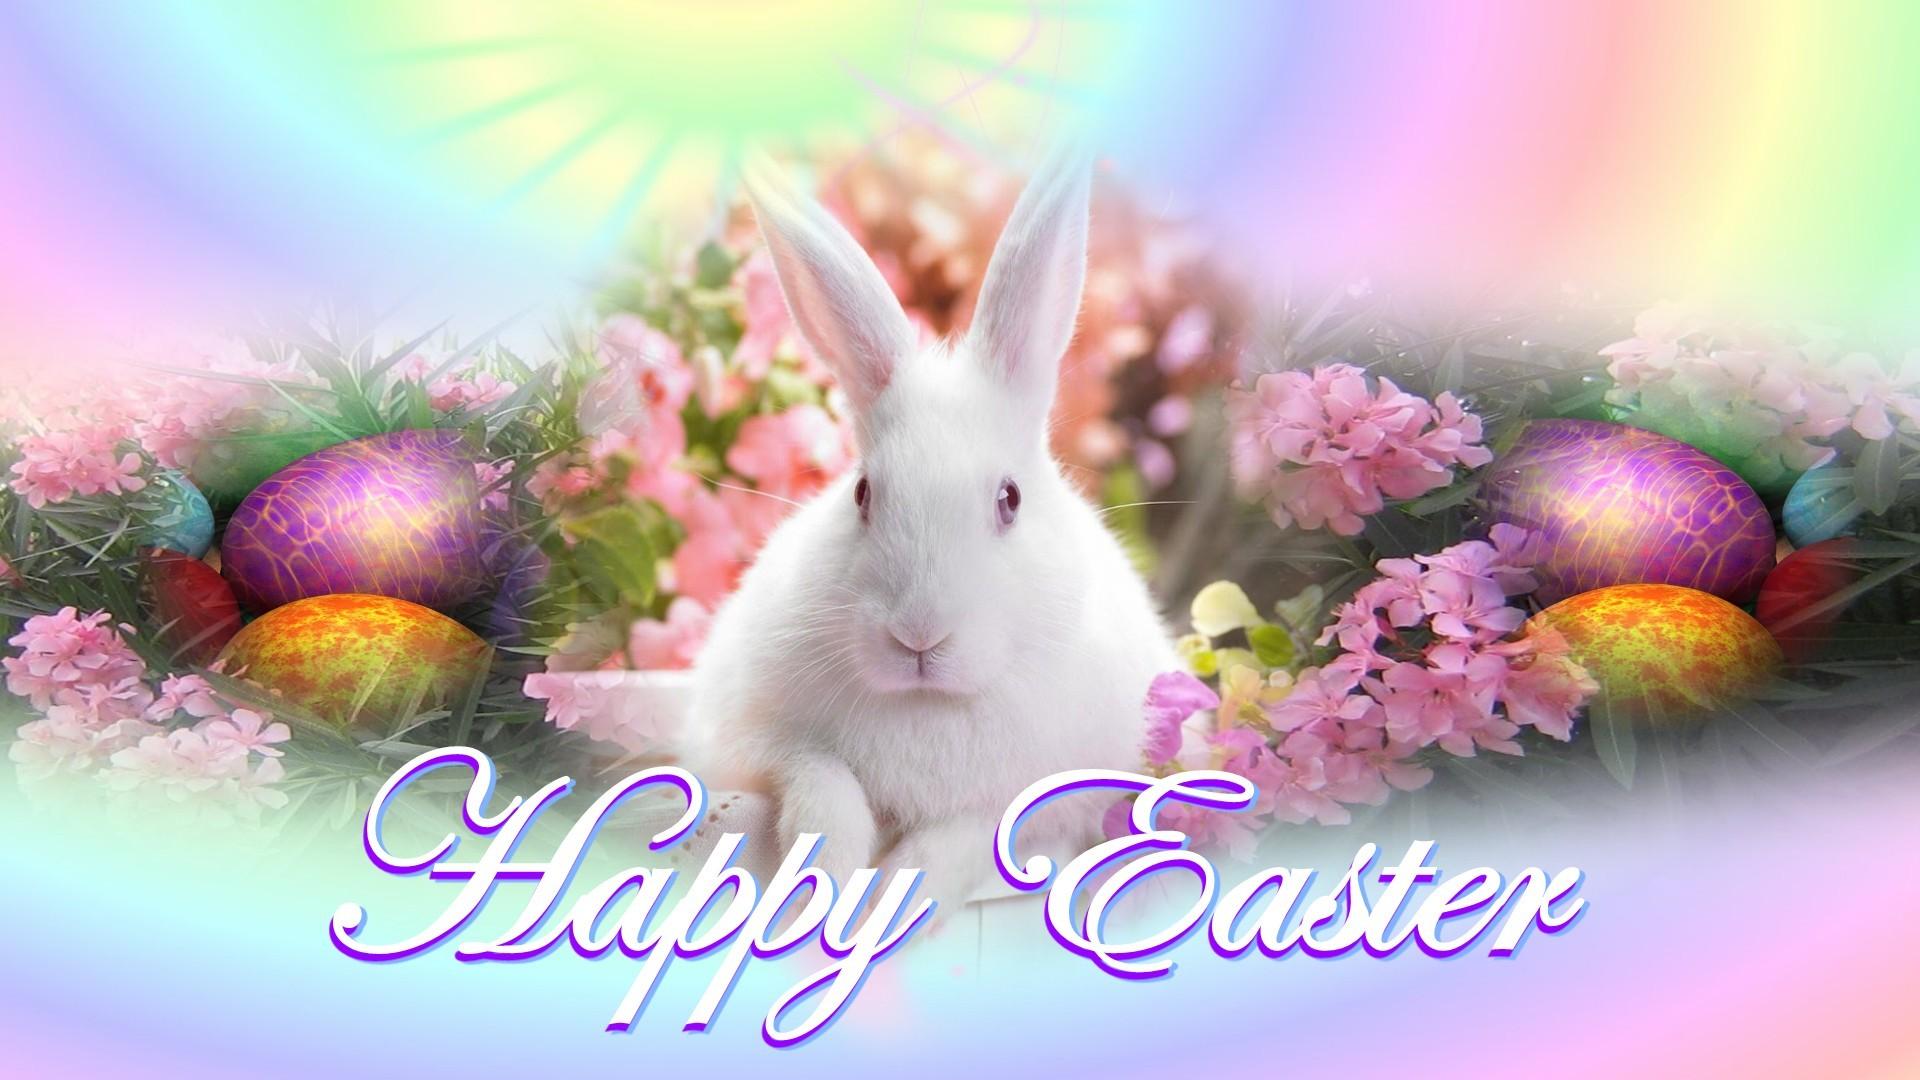 Easter Wallpaper Hd Download Free: [49+] Free Easter Wallpaper For Windows 10 On WallpaperSafari